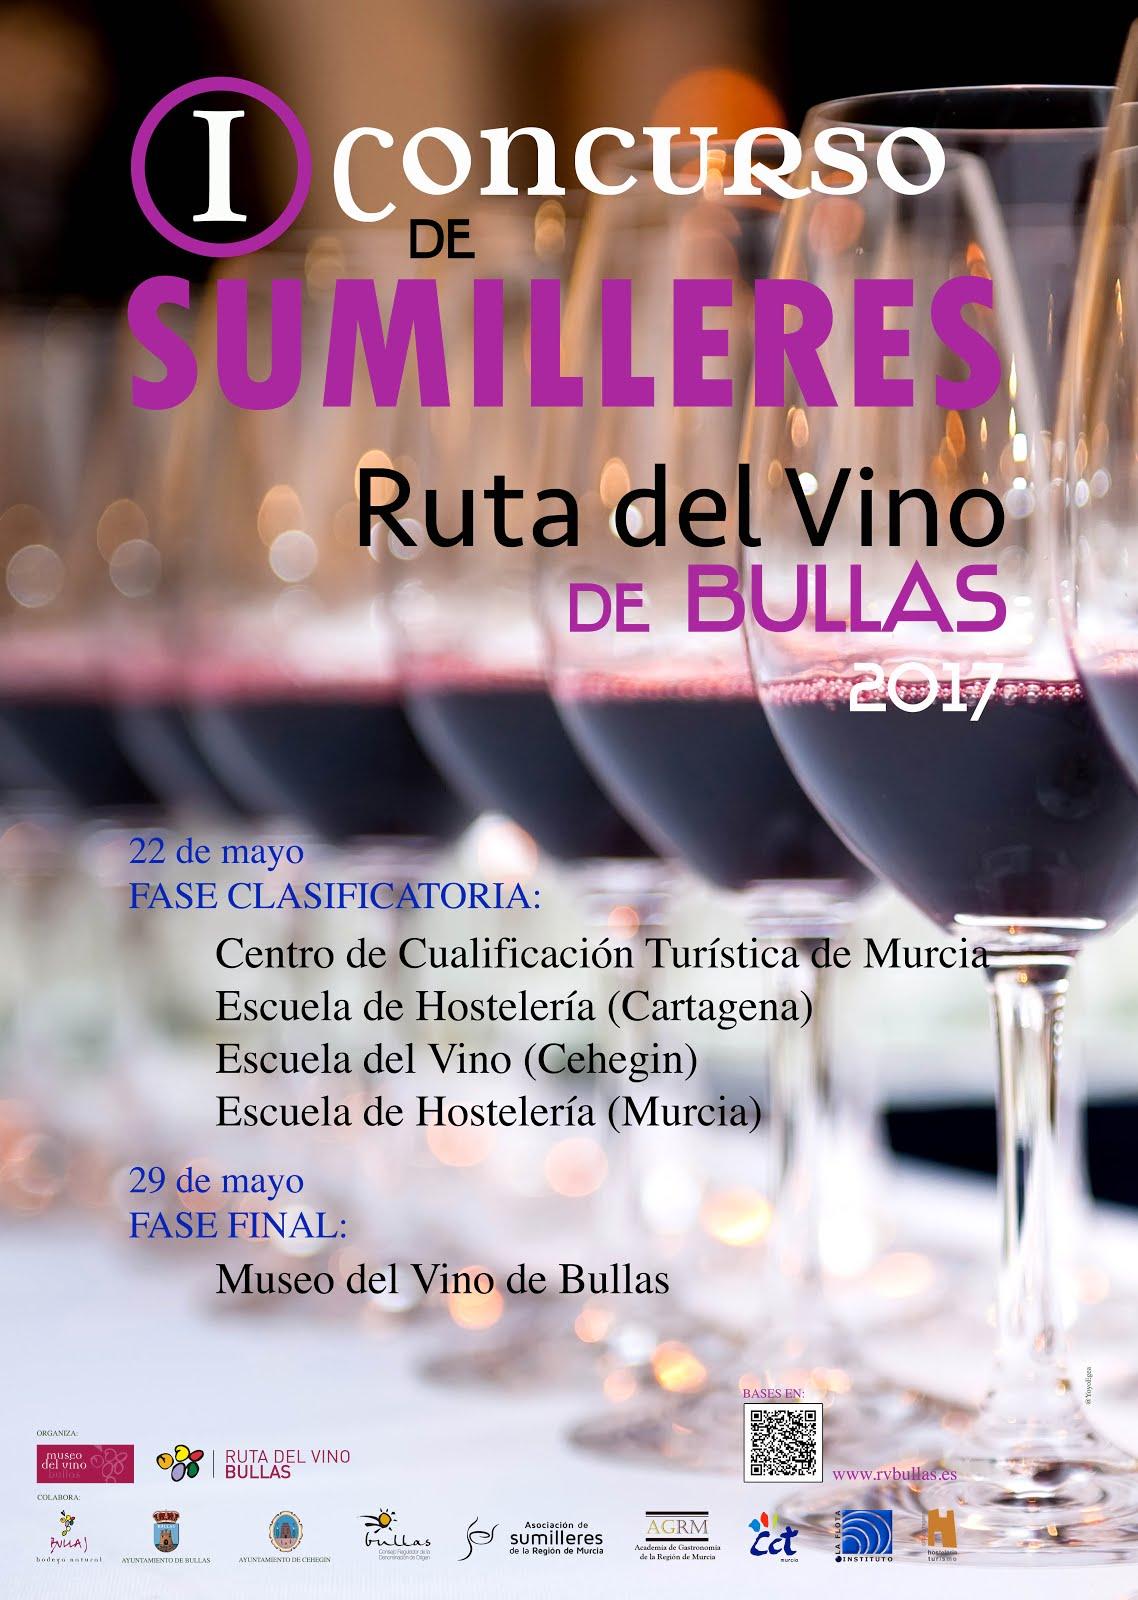 I Concurso de Sumilleres 'Ruta del Vino de Bullas'